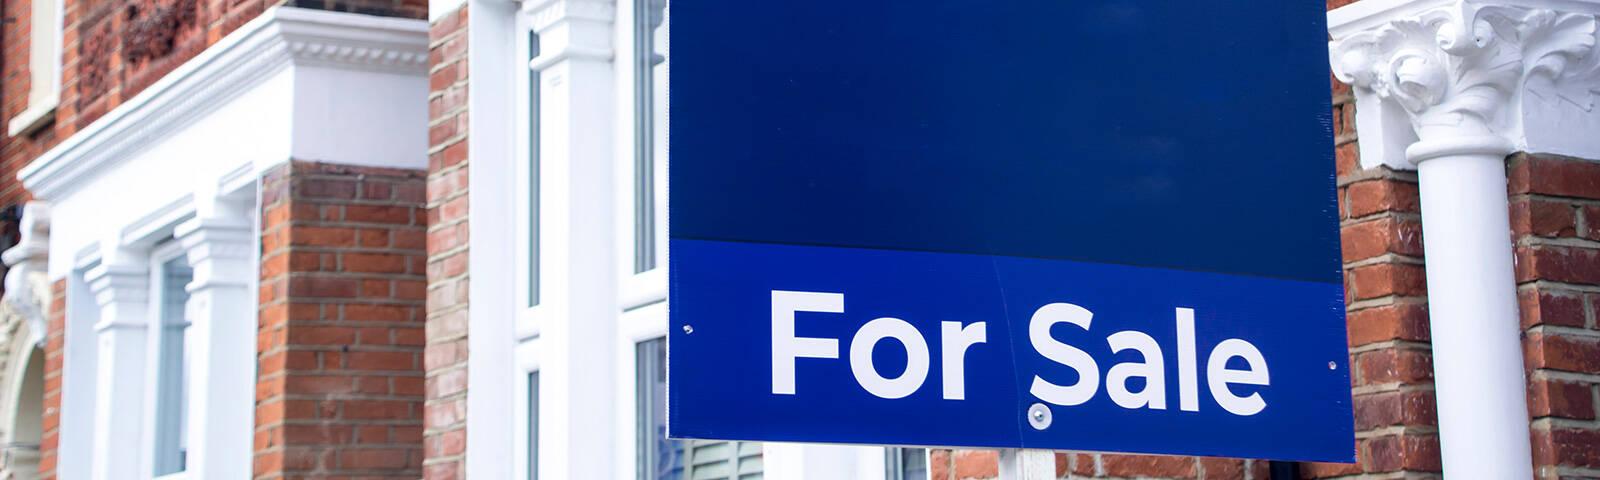 Signboard fixing ideas